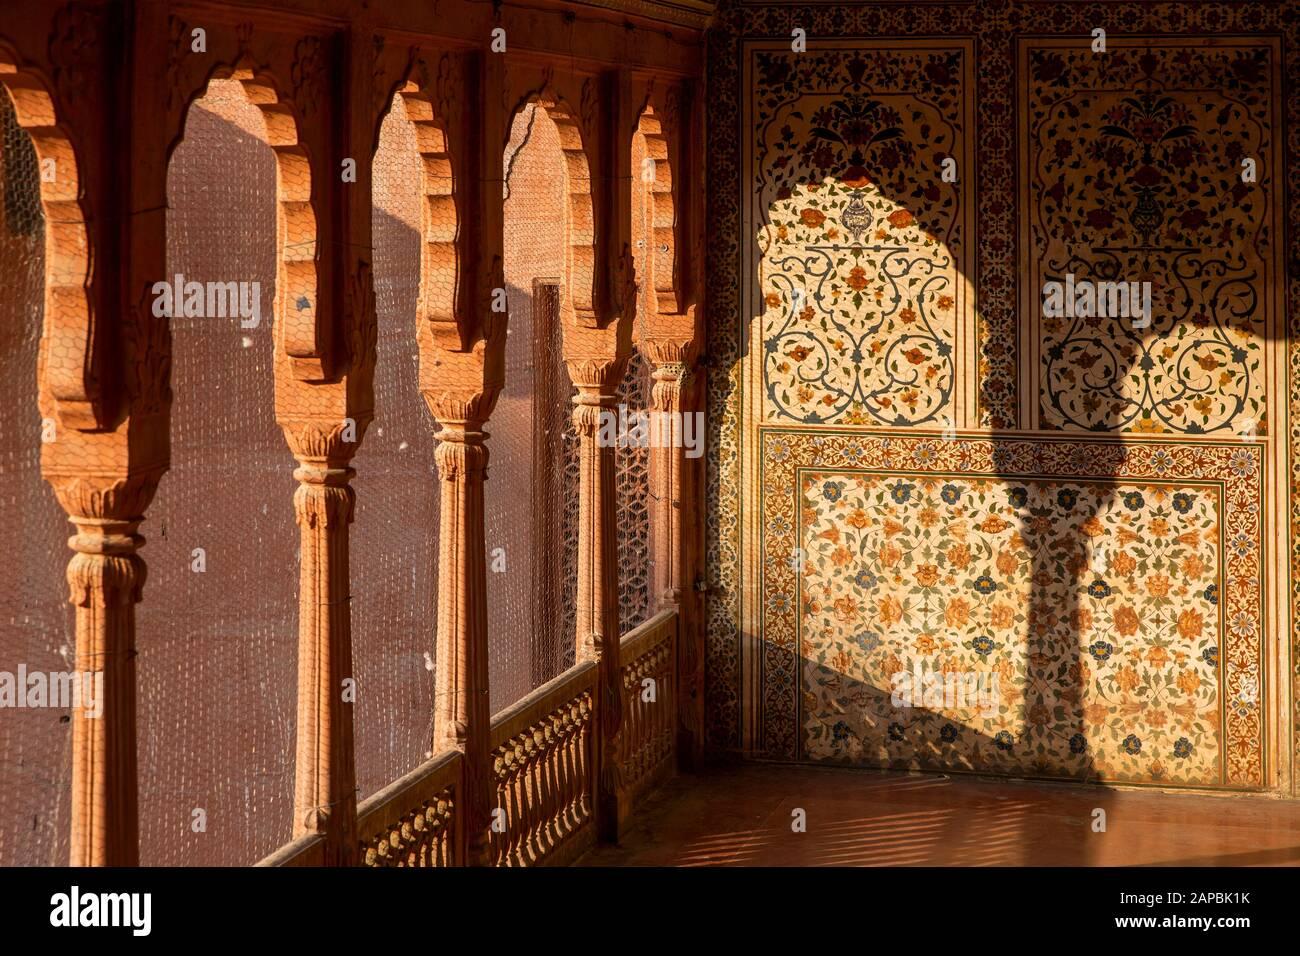 India, Rajasthan, Shekhawati, Bikaner, city centre, Junagarh Fort, light though pillars onto painted walls to look like pieta dura stone inlay above A Stock Photo